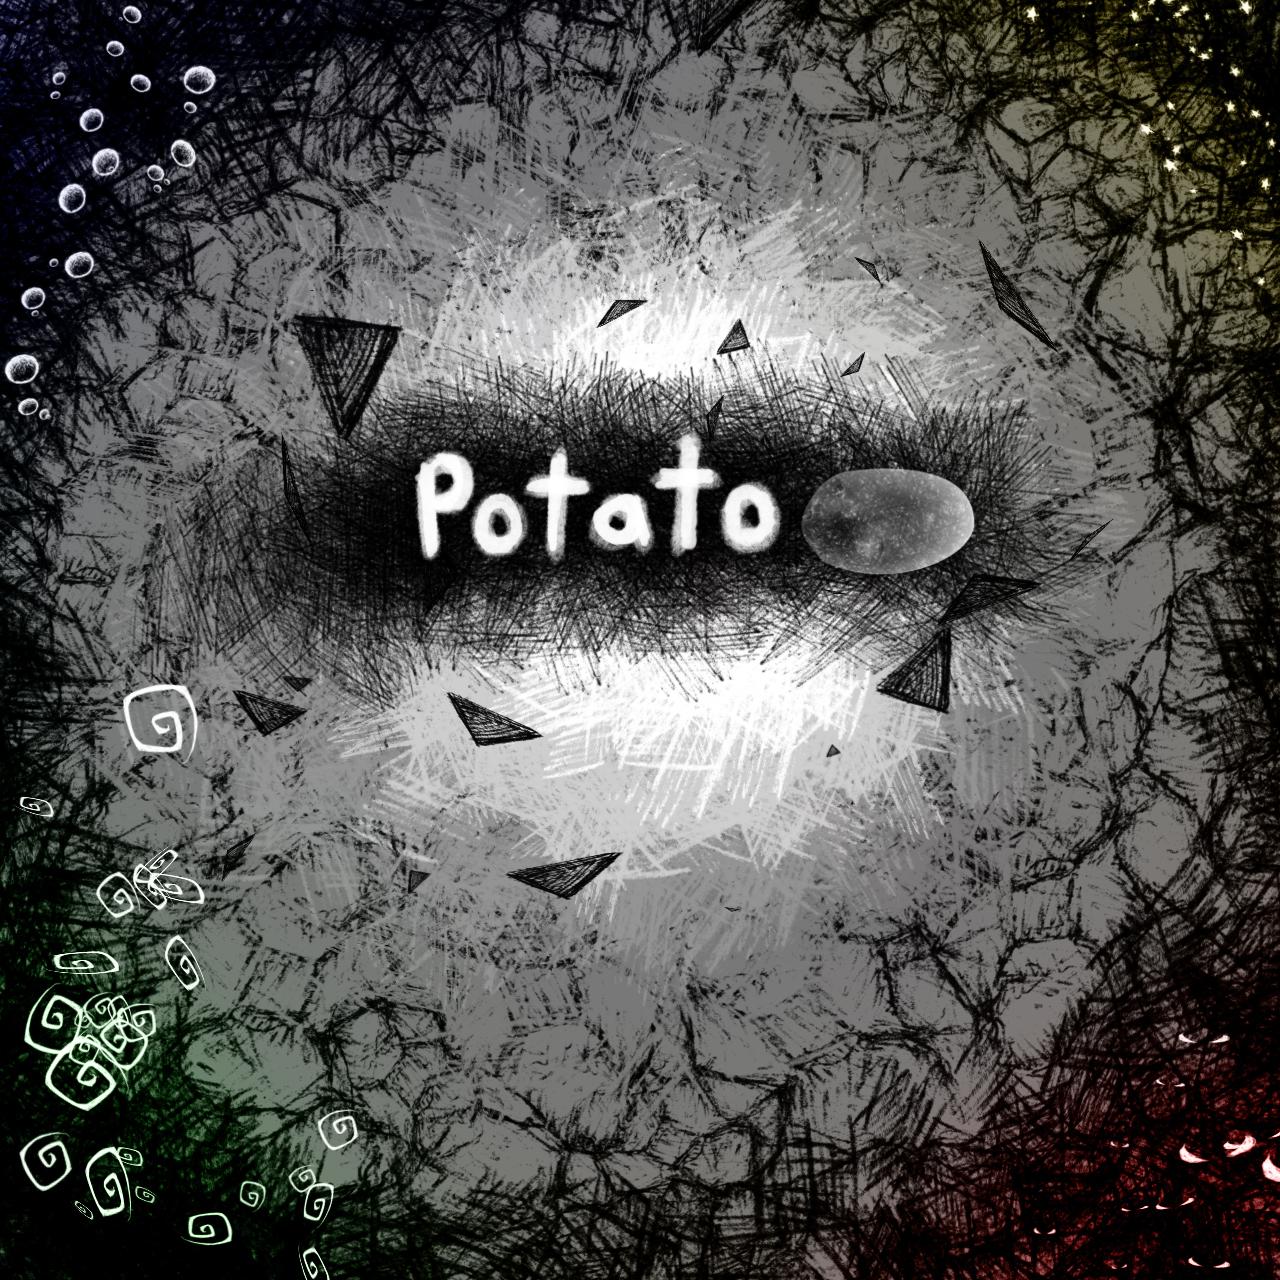 Potato.abr